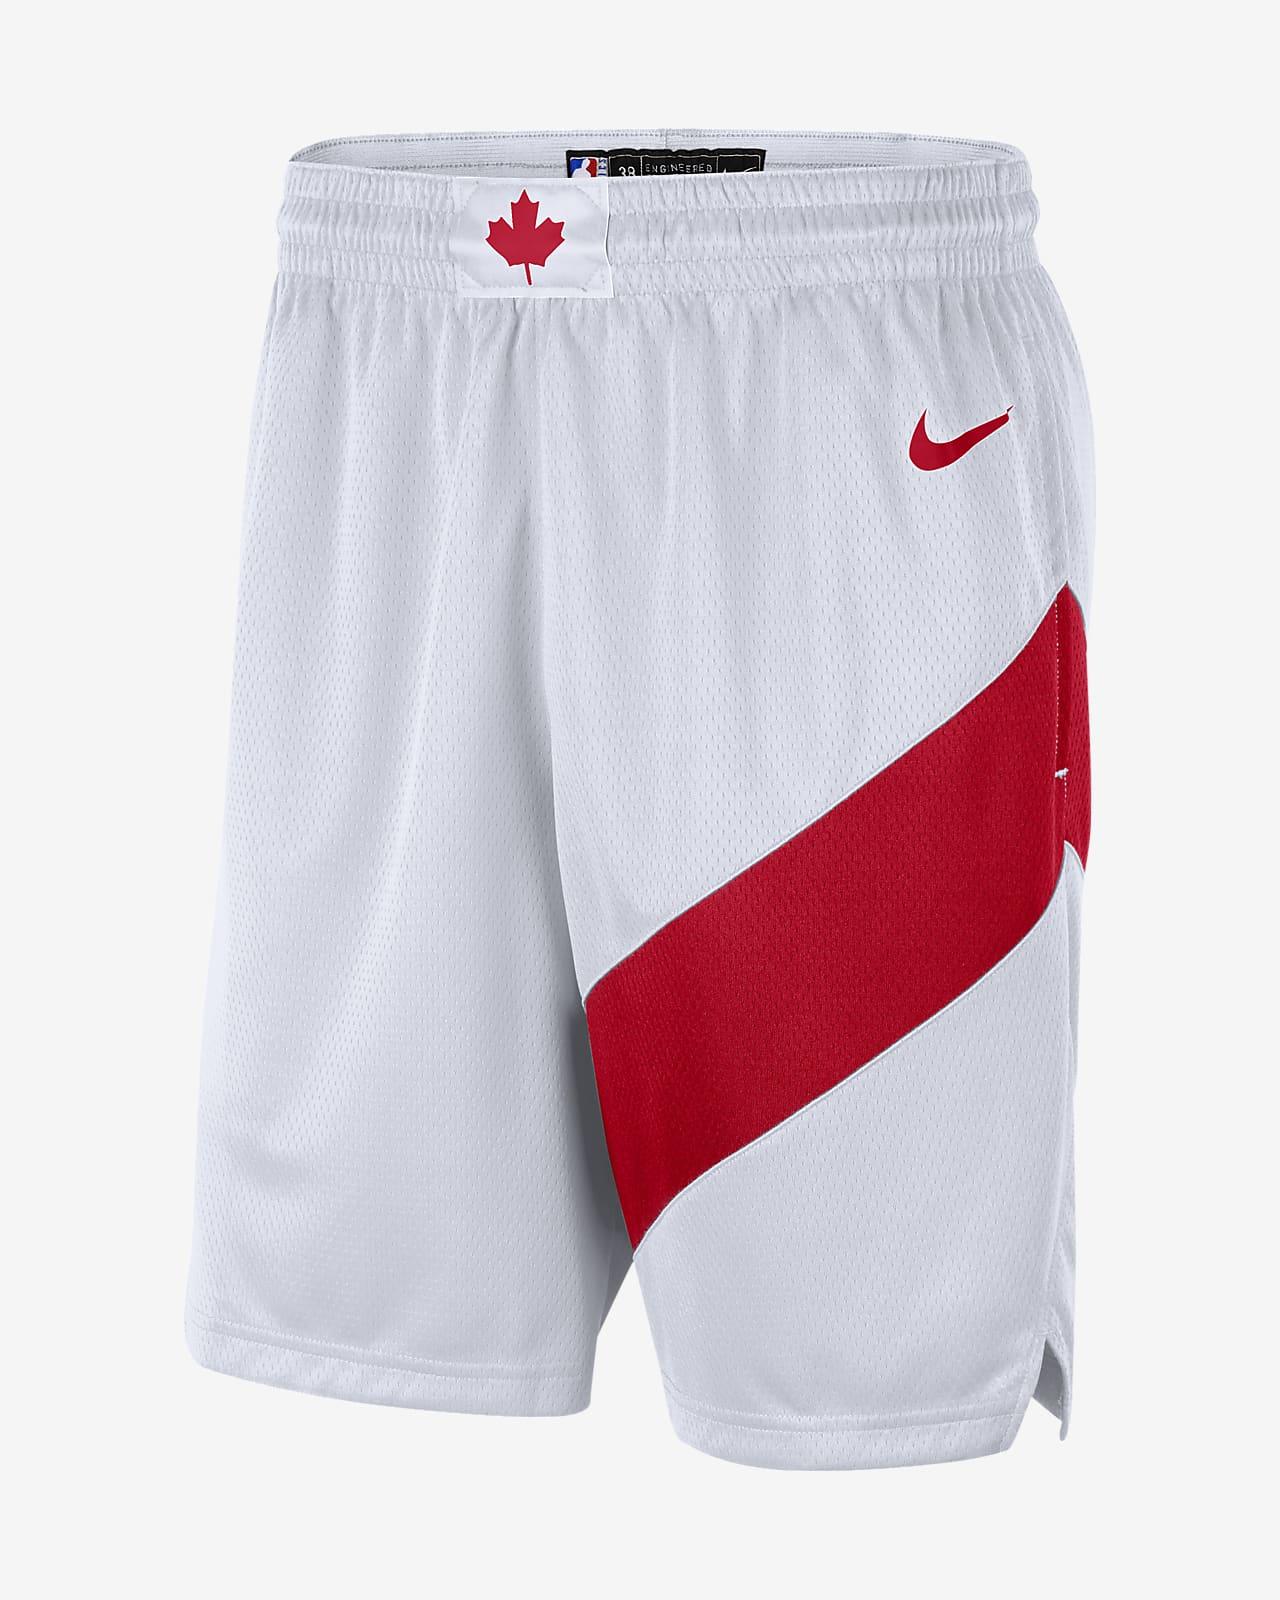 Raptors Association Edition 2020 Swingman Nike NBA-herenshorts